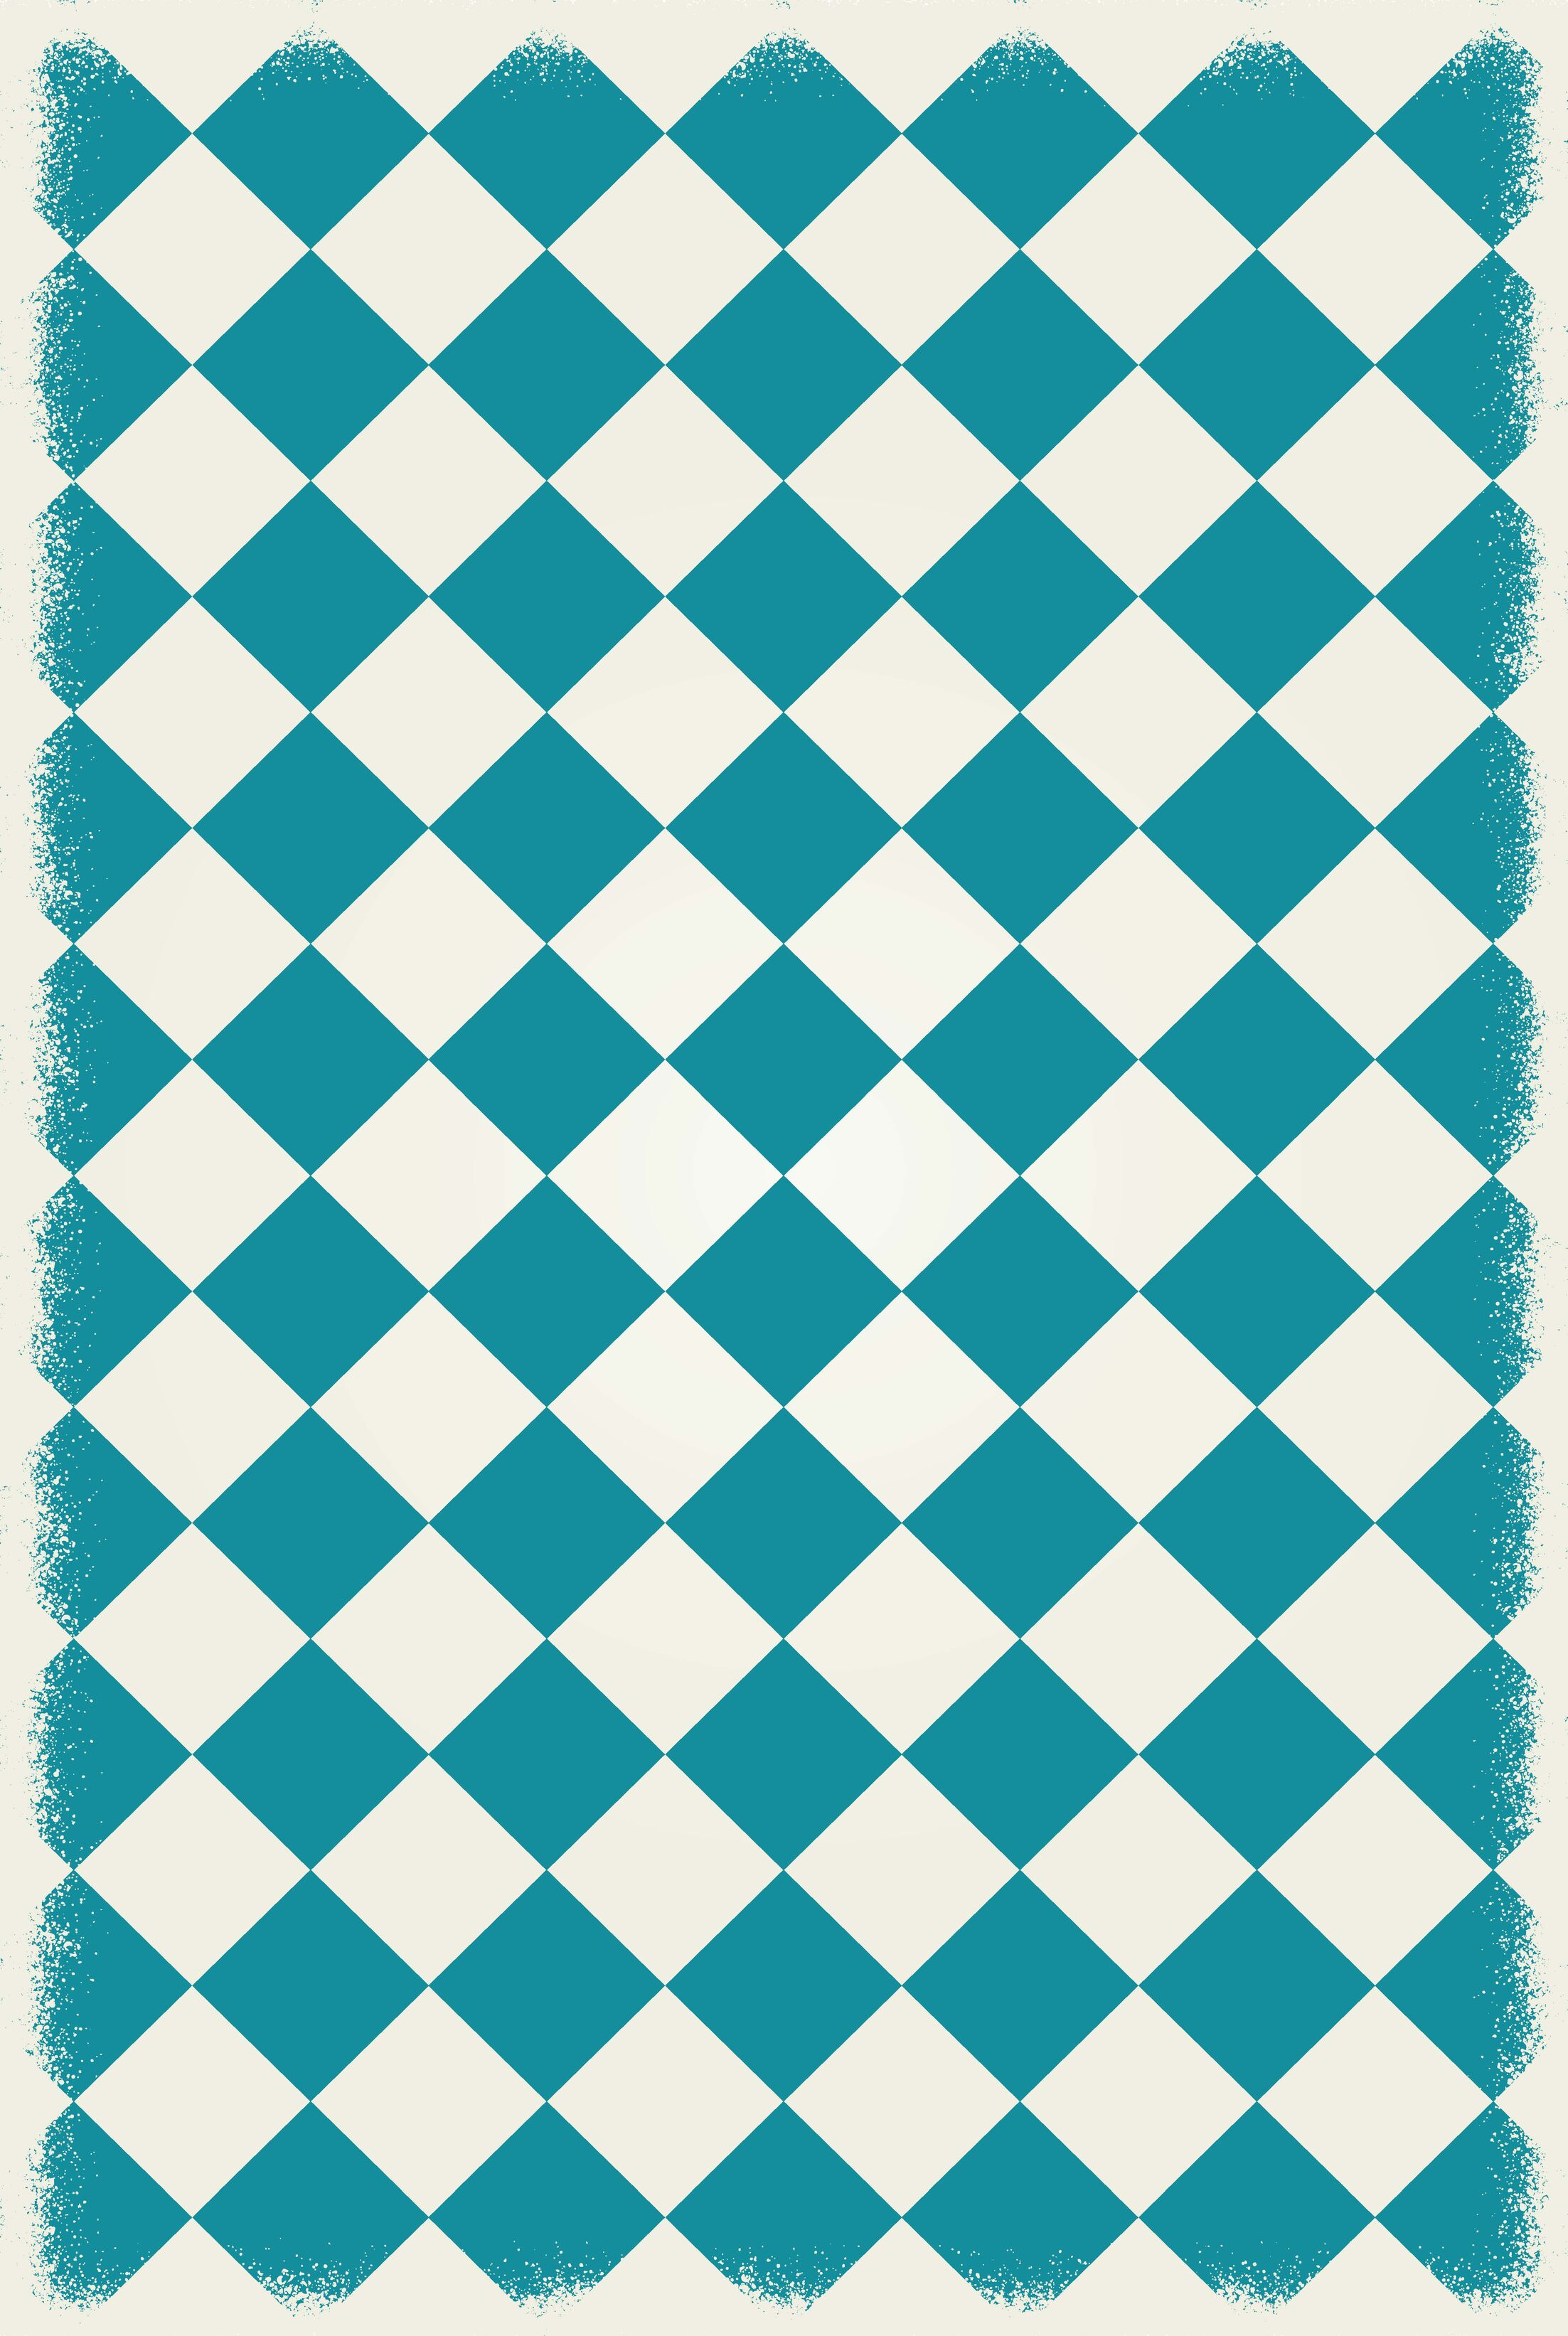 Wendland Diamond European Design Teal/White Indoor/Outdoor Area Rug Rug Size: Rectangle 4' x 6'